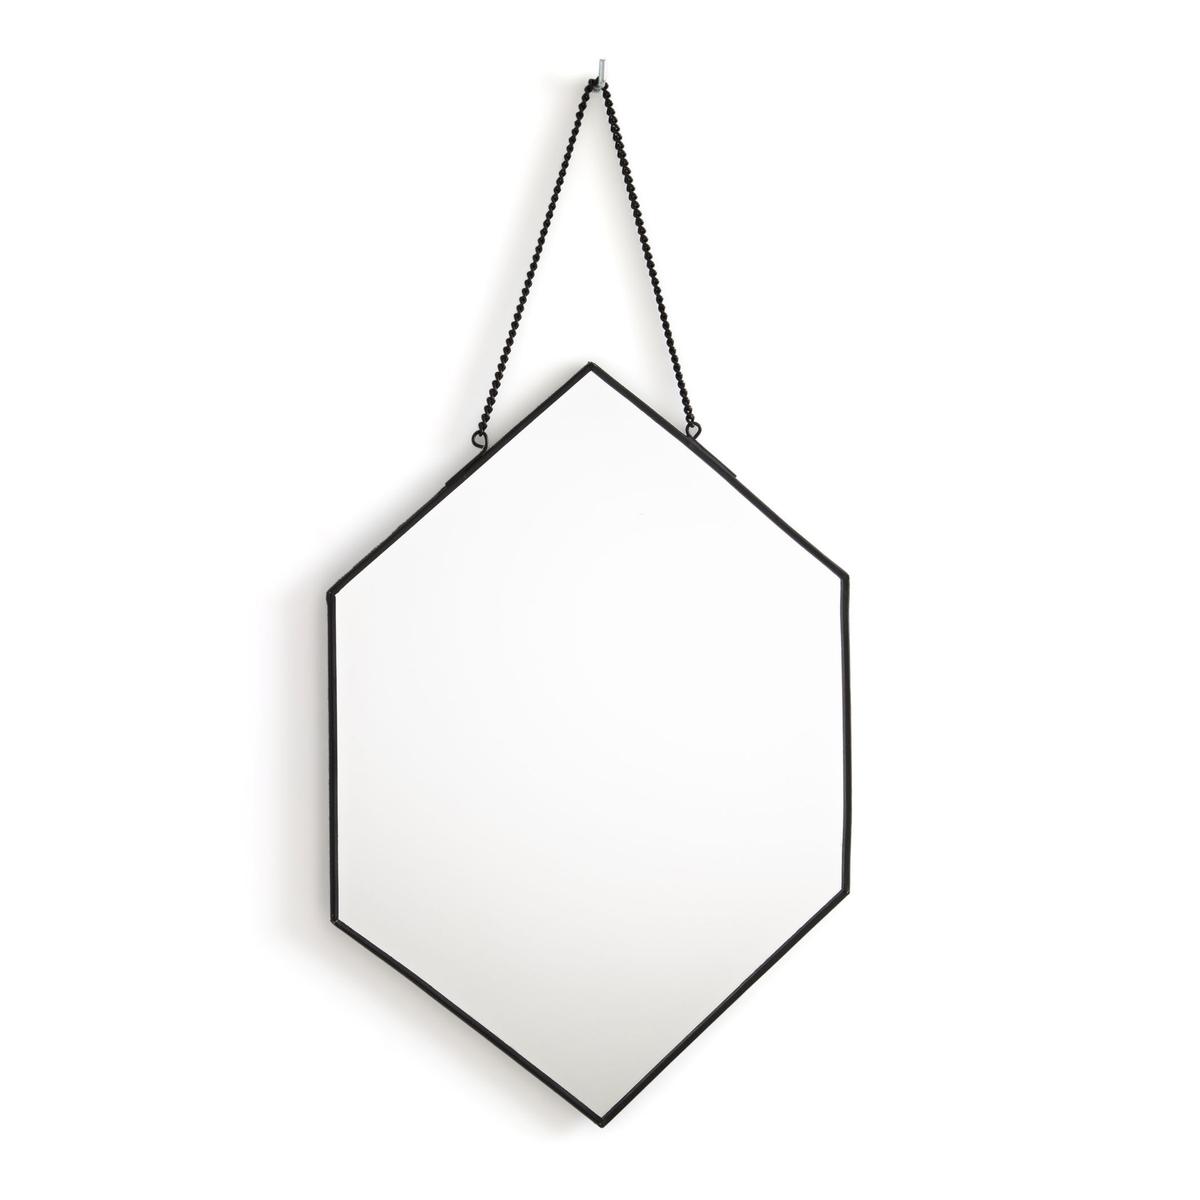 Зеркало La Redoute В форме шестиугольника Uyova единый размер черный зеркала la redoute uyova в форме домика единый размер желтый